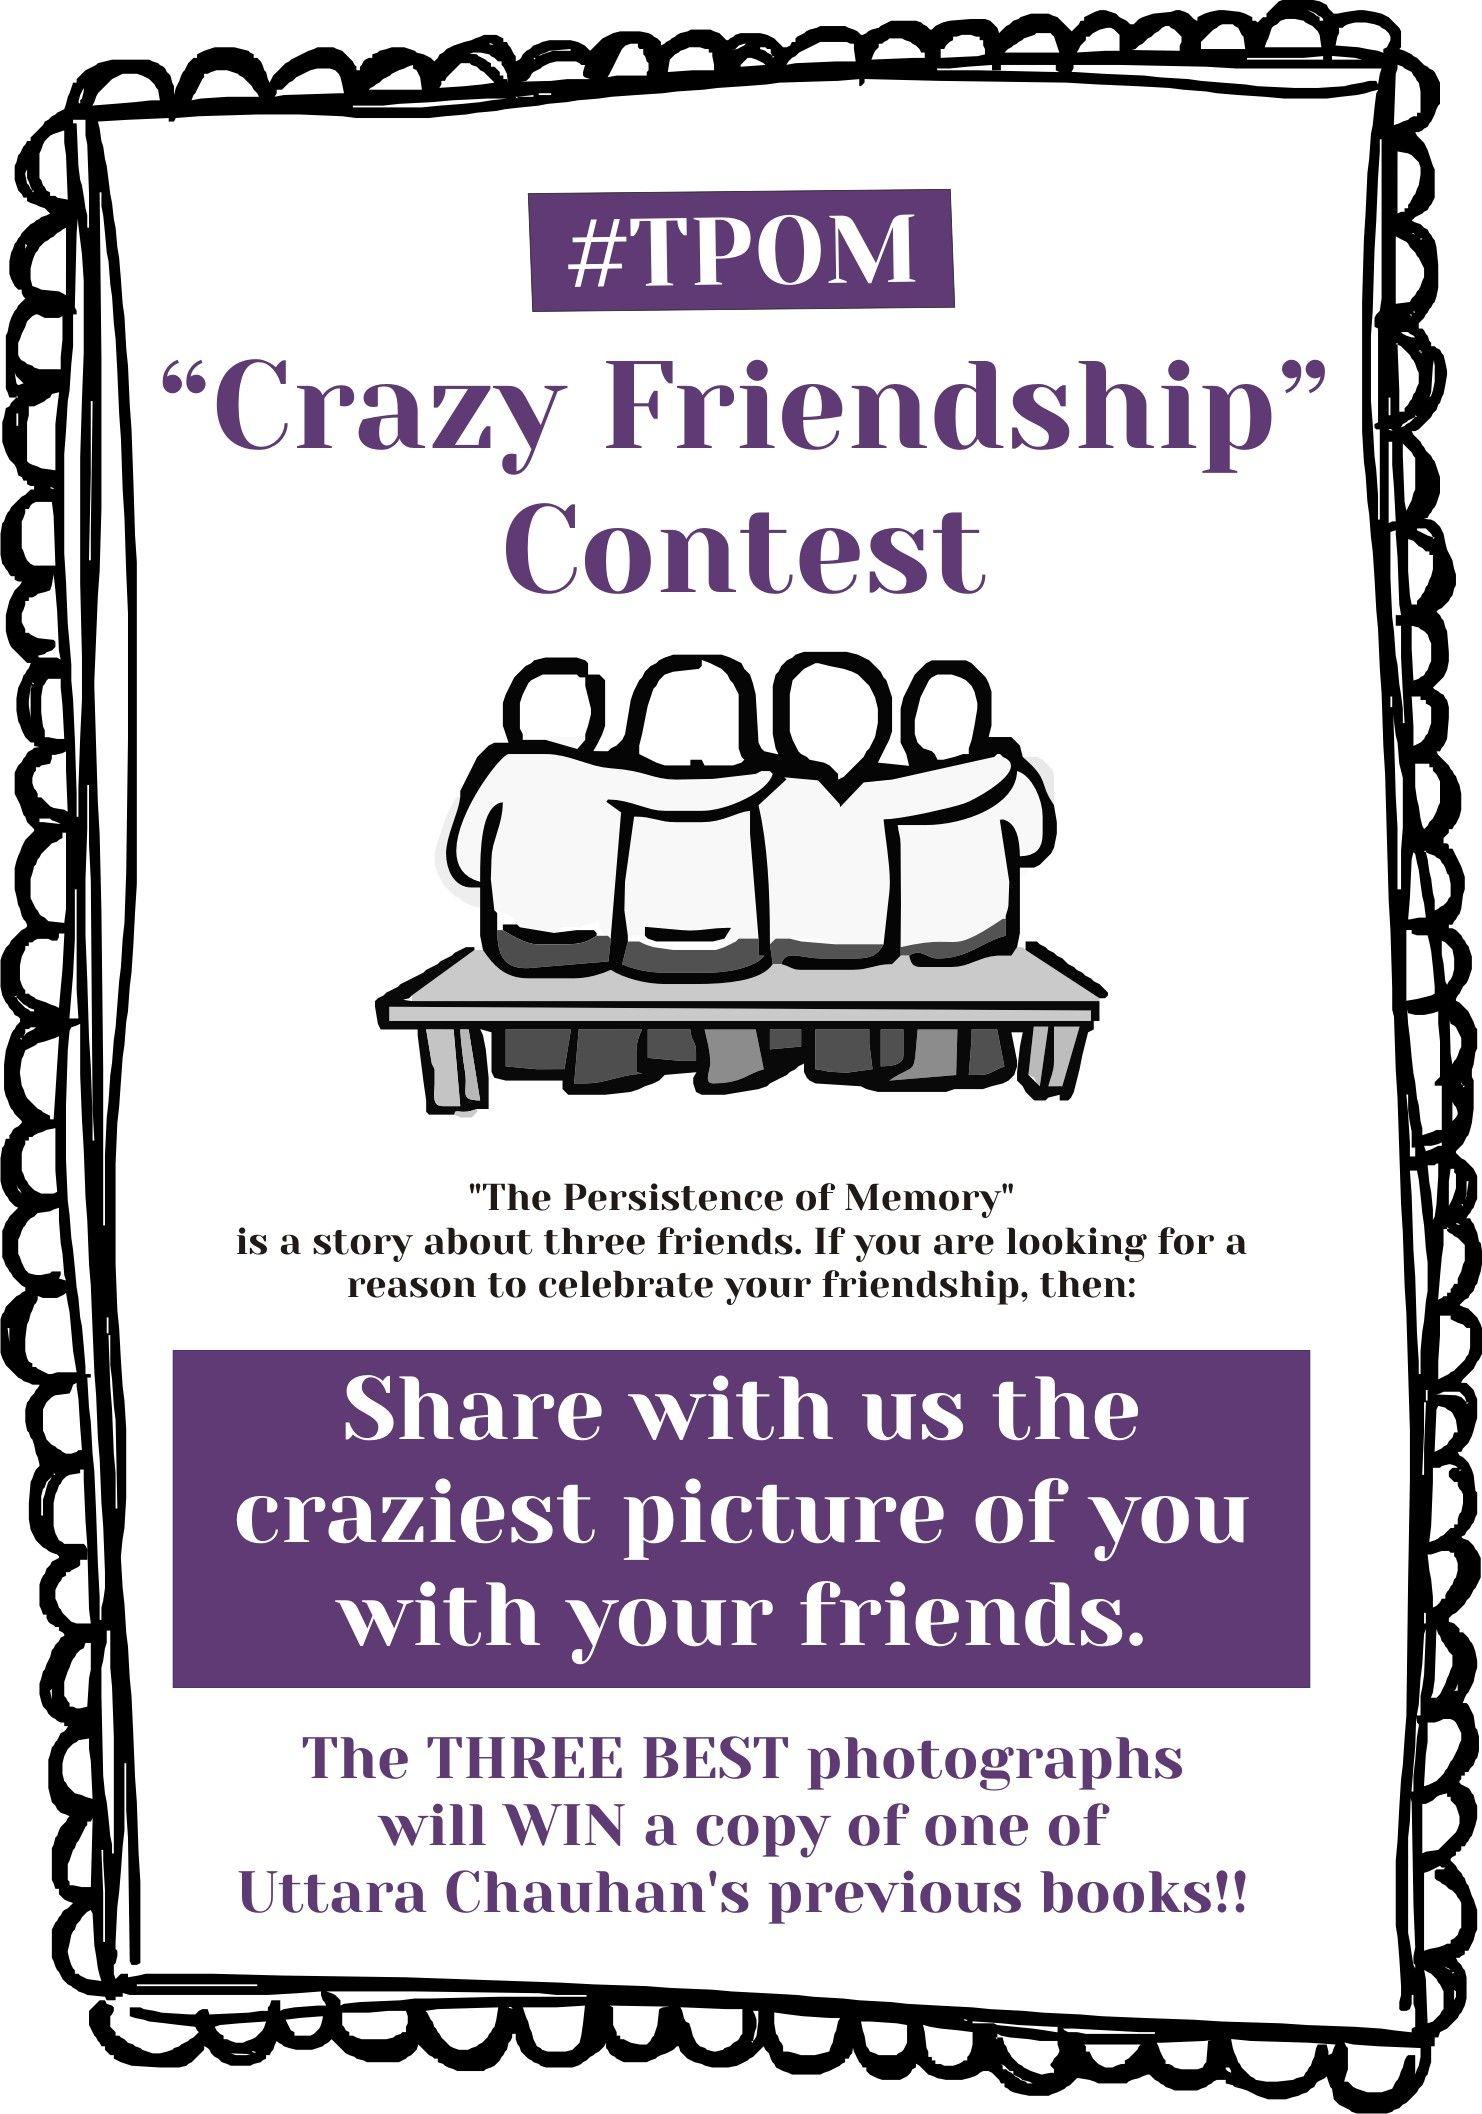 #CrazyFriendship Contest Announcement